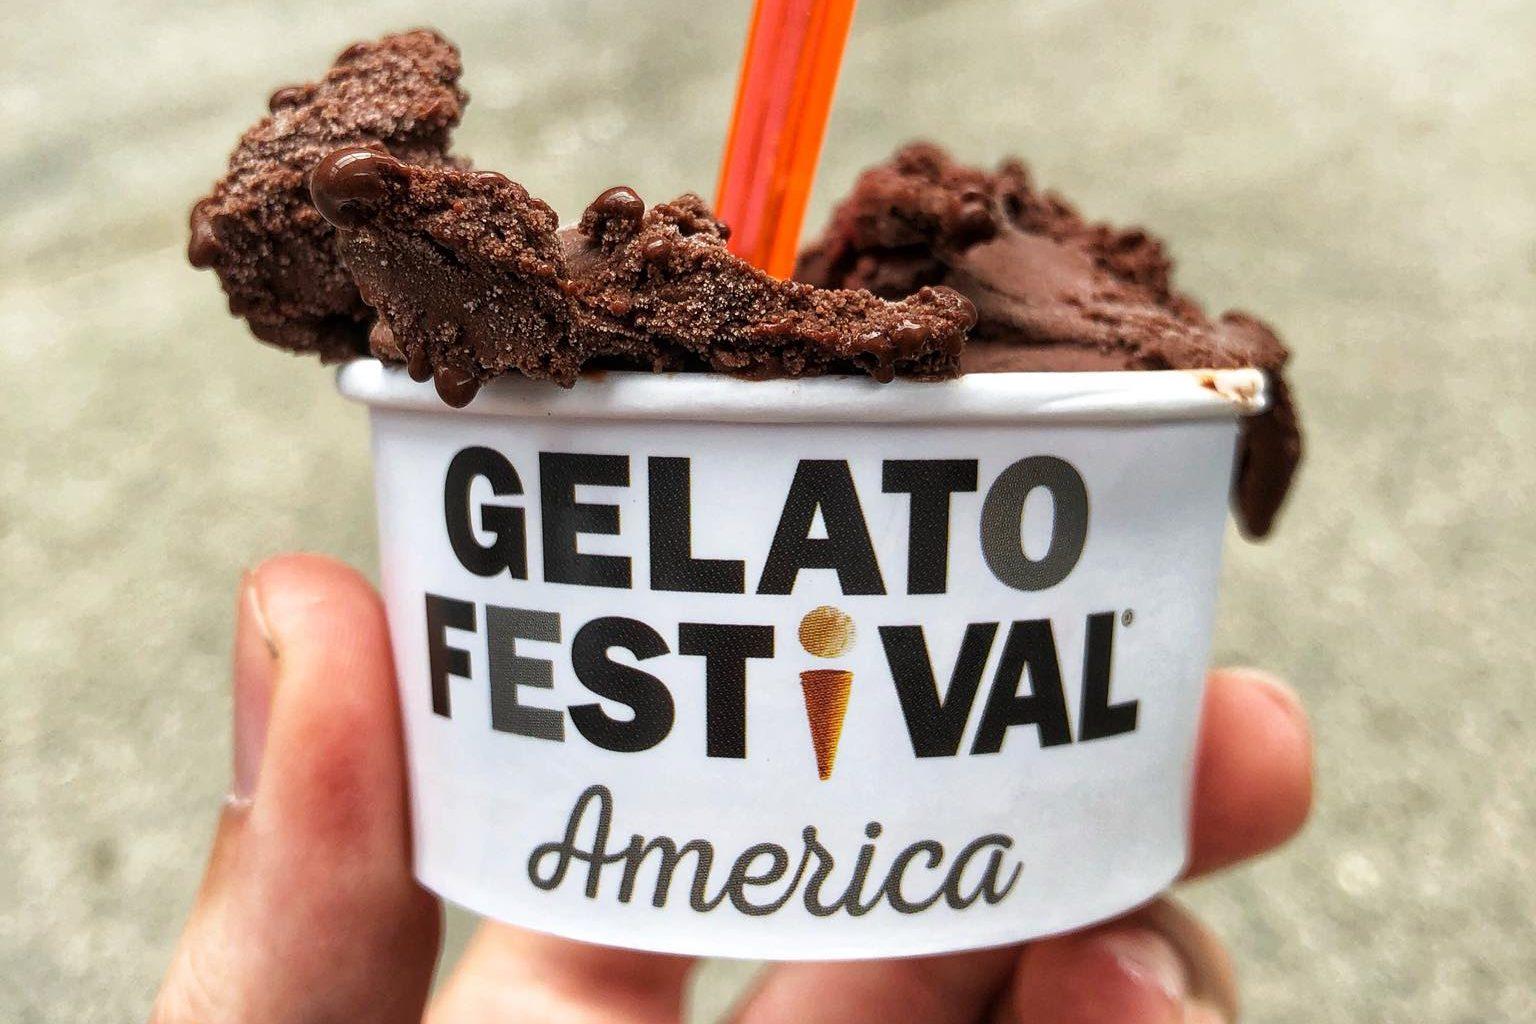 Gelato Festival America Jersey City, New Jersey 2018 Foodist @foodisteats